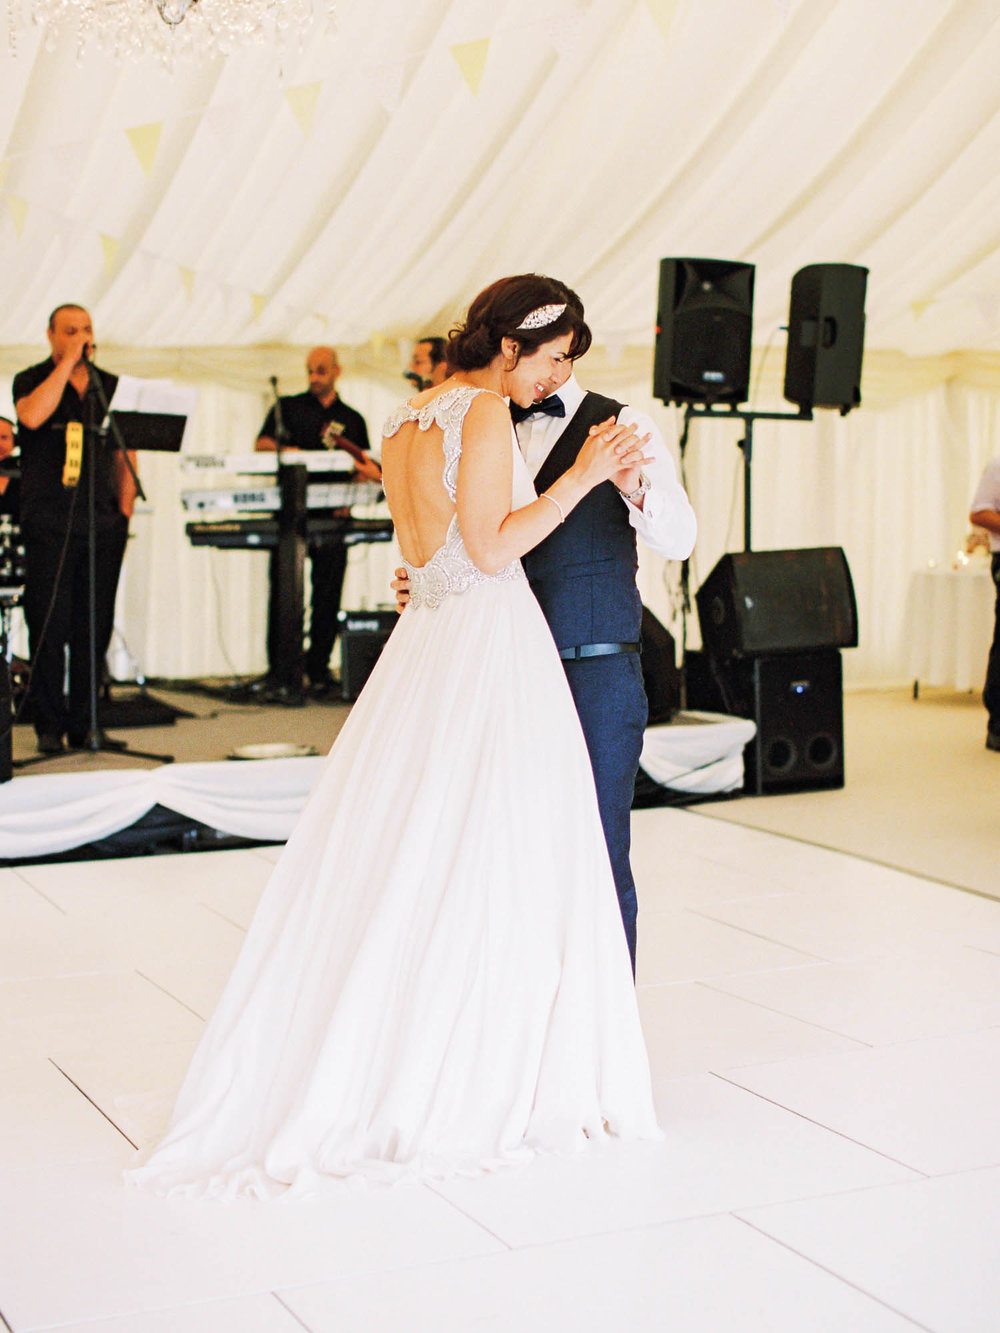 Amy O'Boyle Photography- Destination & UK Fine Art Film Wedding Photographer- Brickendonbury Estate Wedding-37.jpg